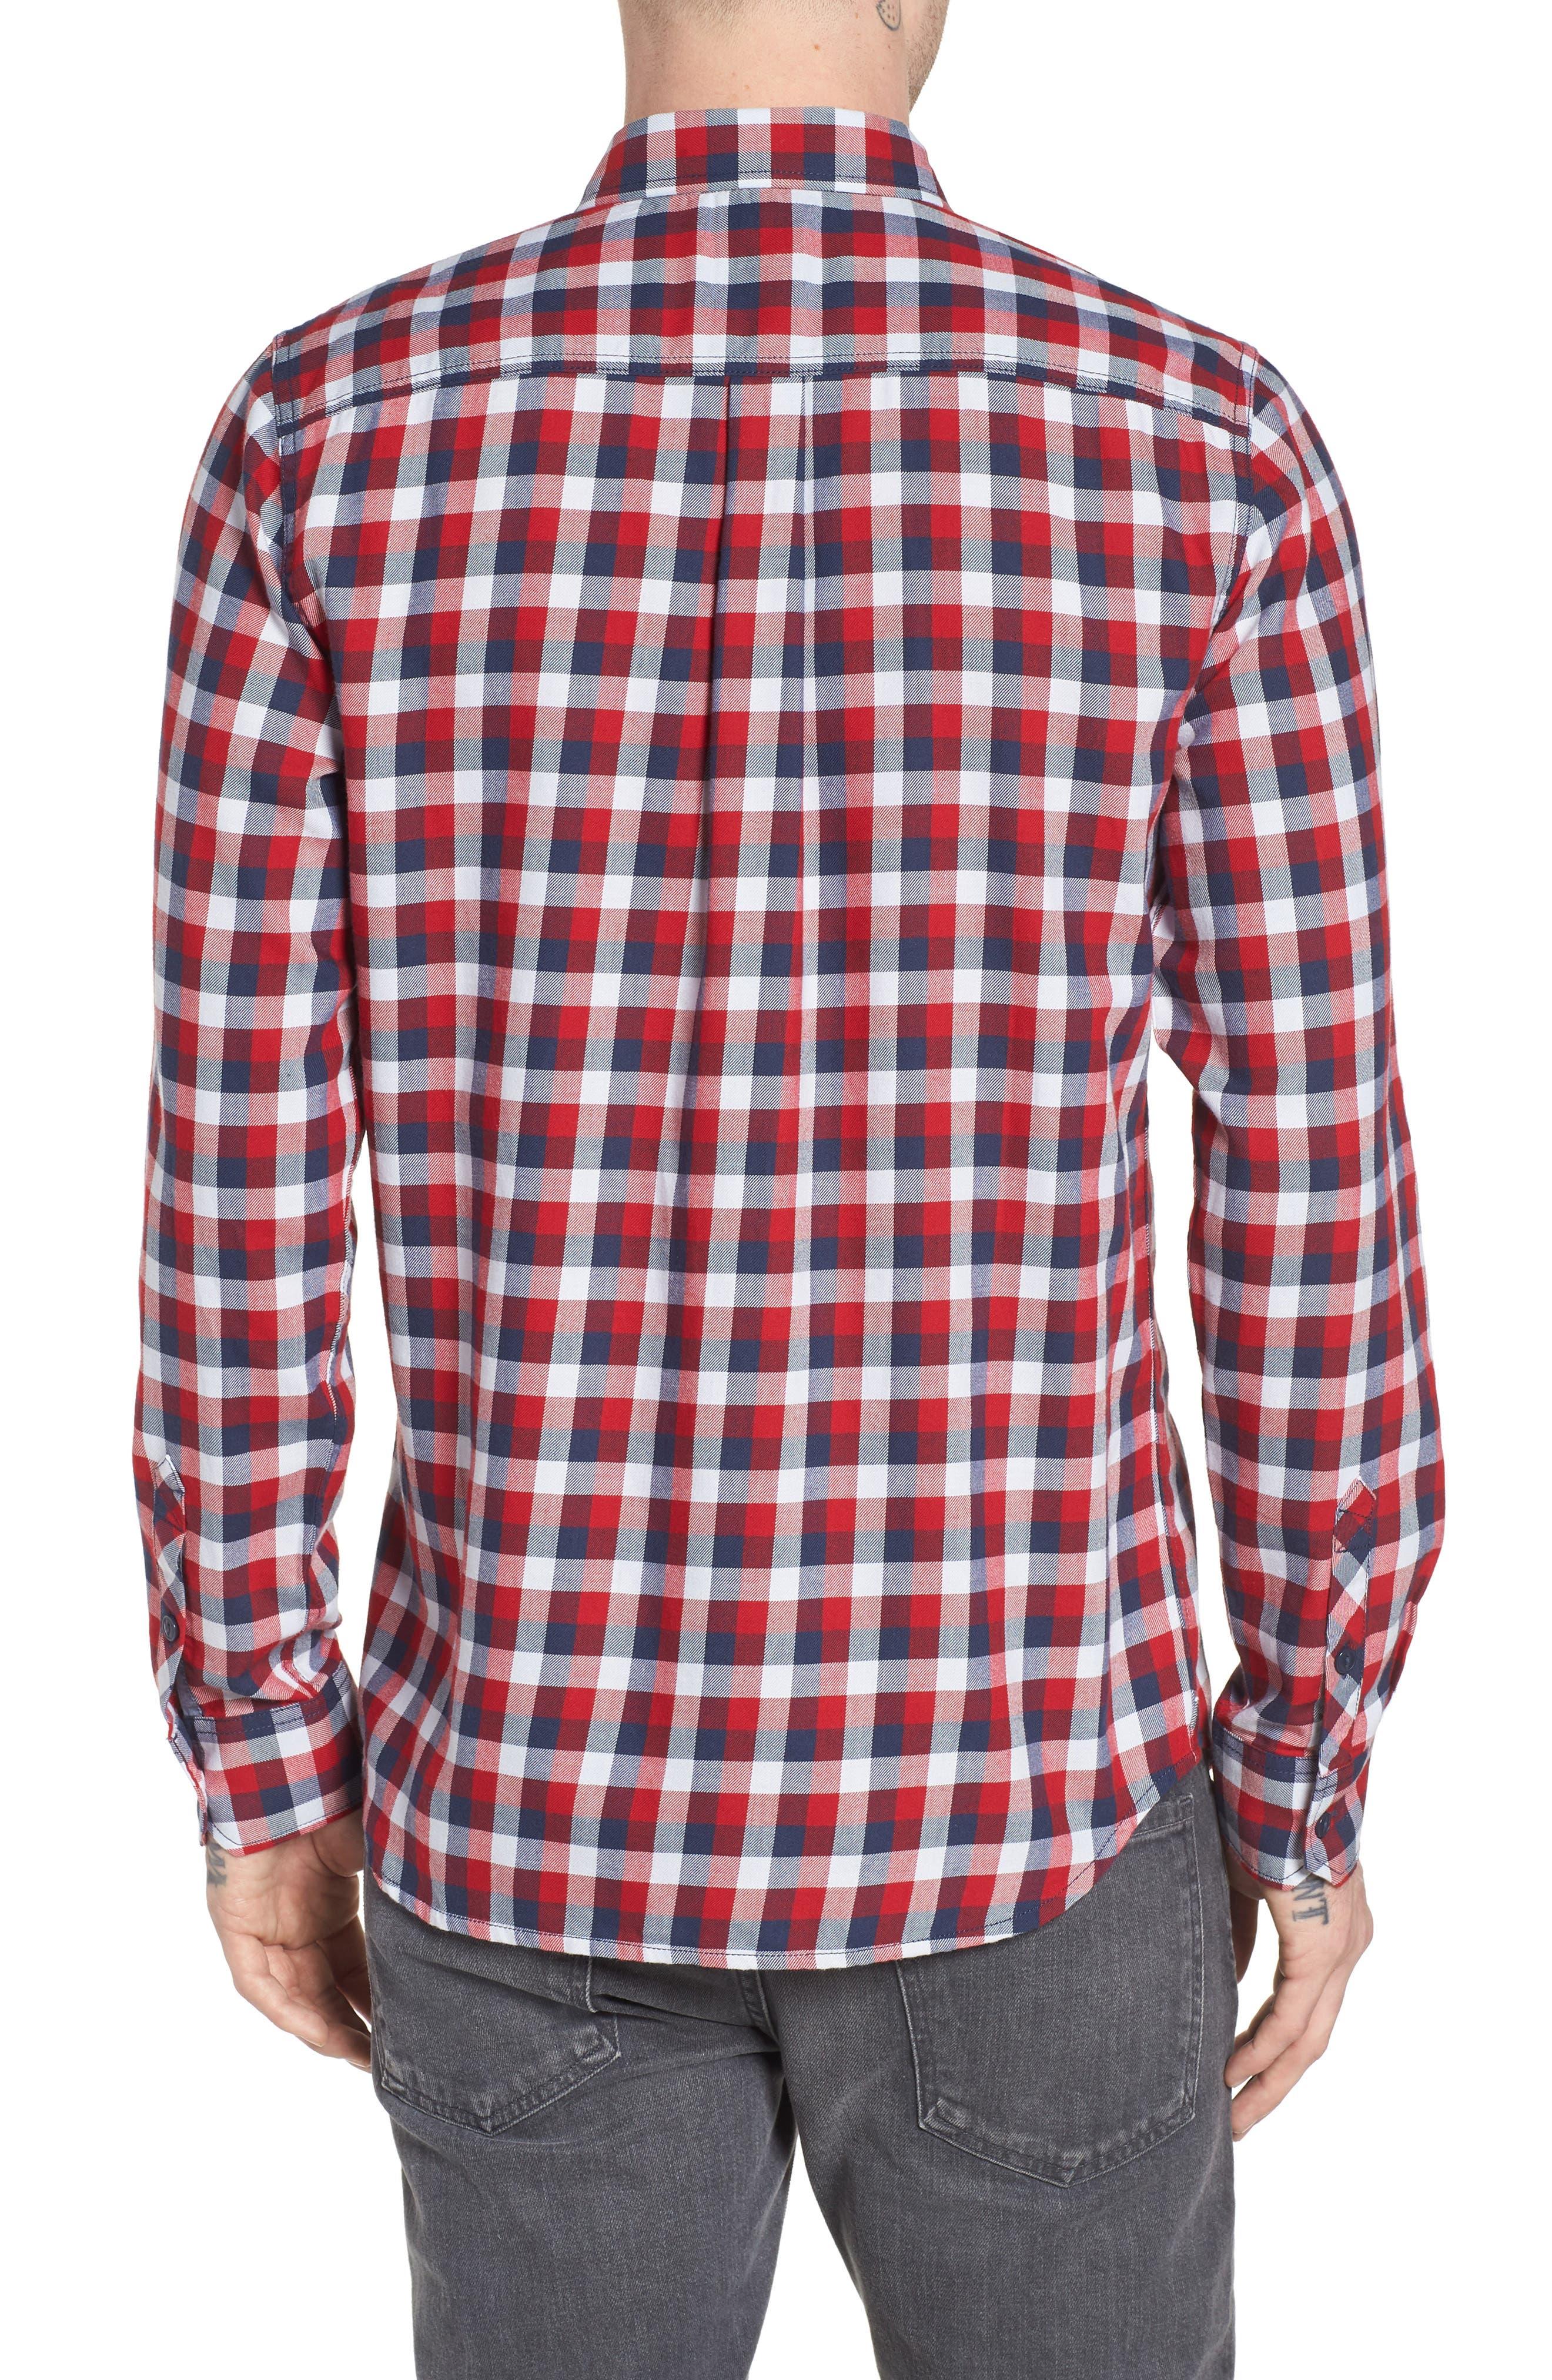 Alternate Image 2  - Vans Alameda II Plaid Flannel Shirt